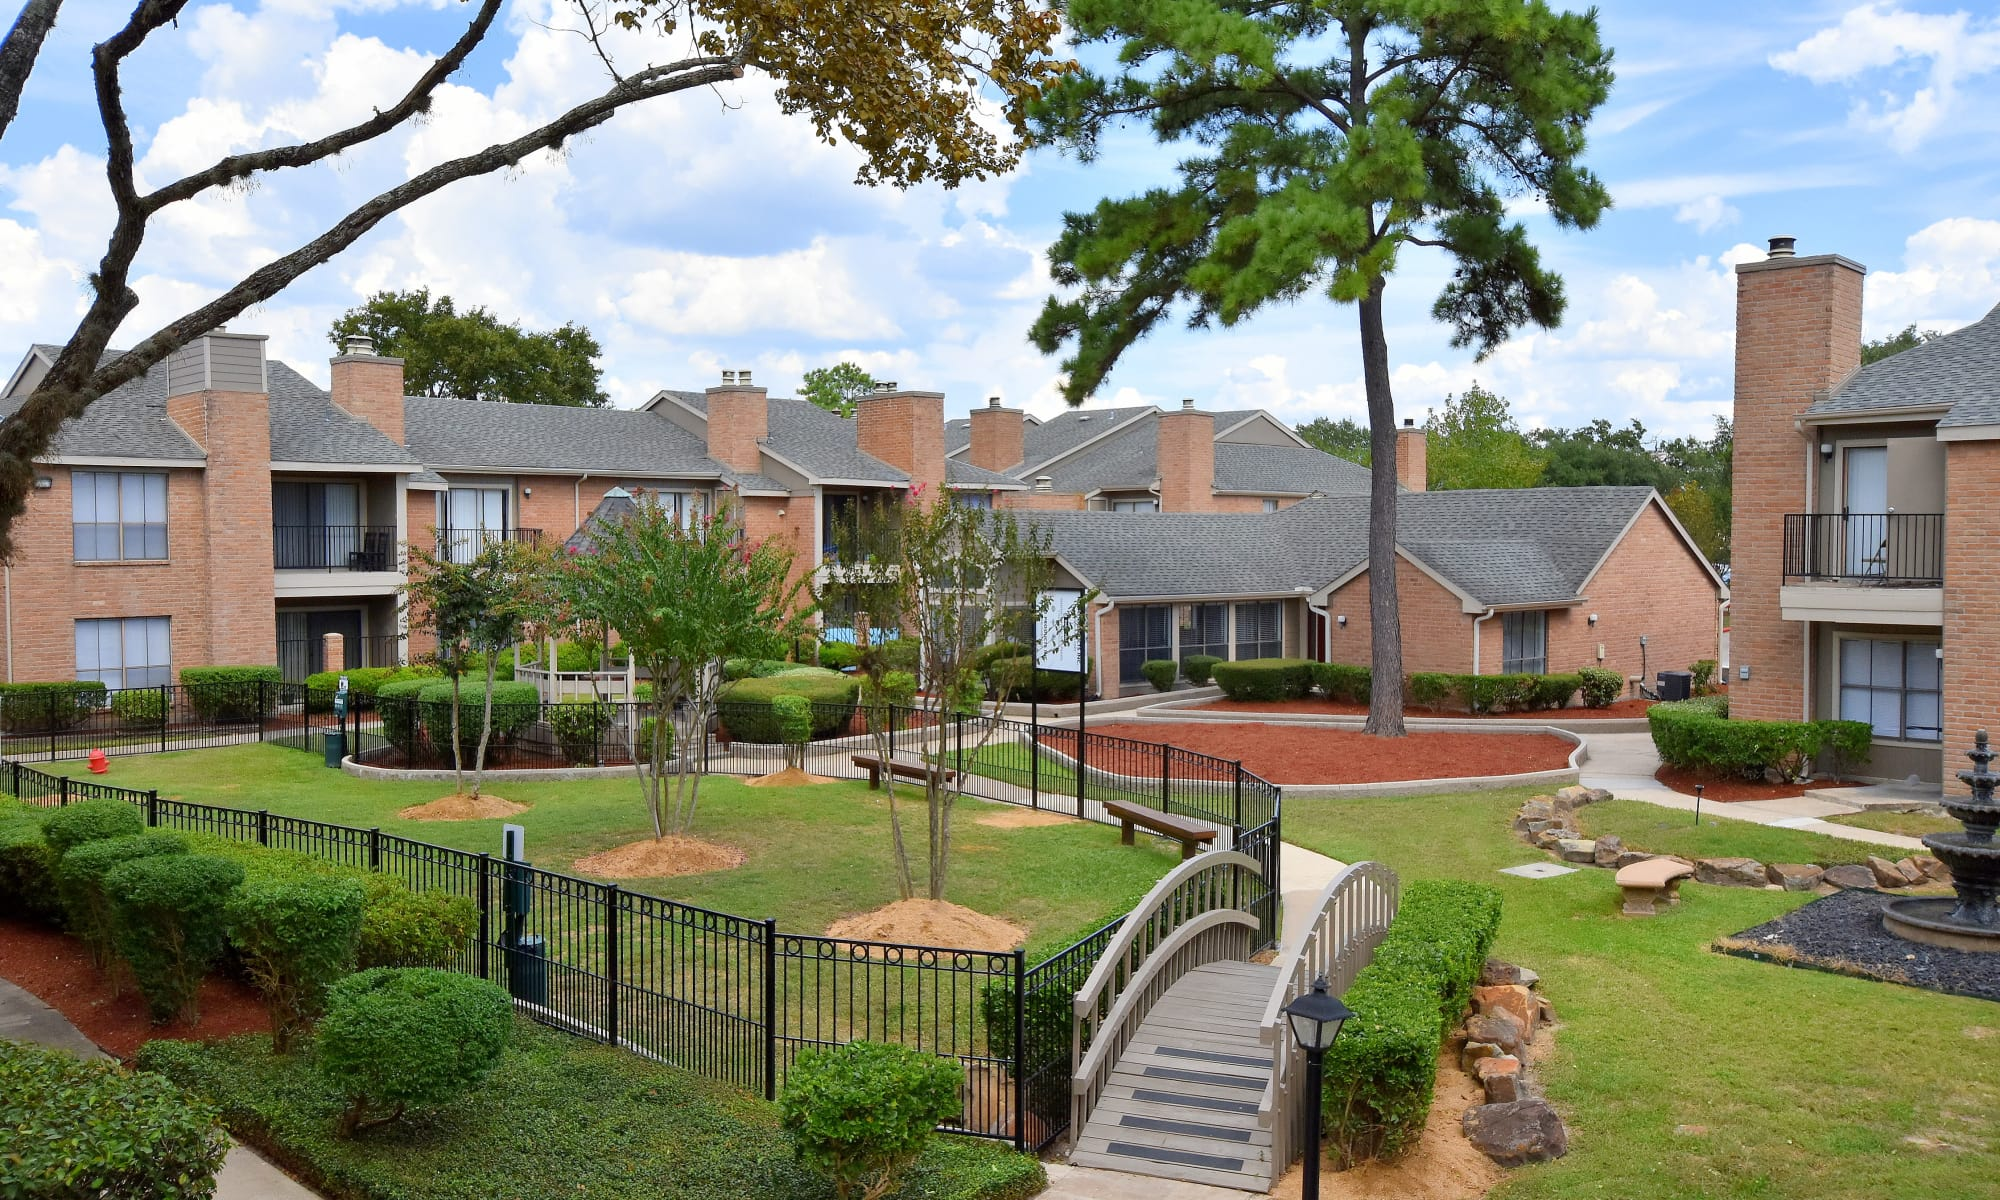 Deerbrook Garden Apartments in Humble, TX